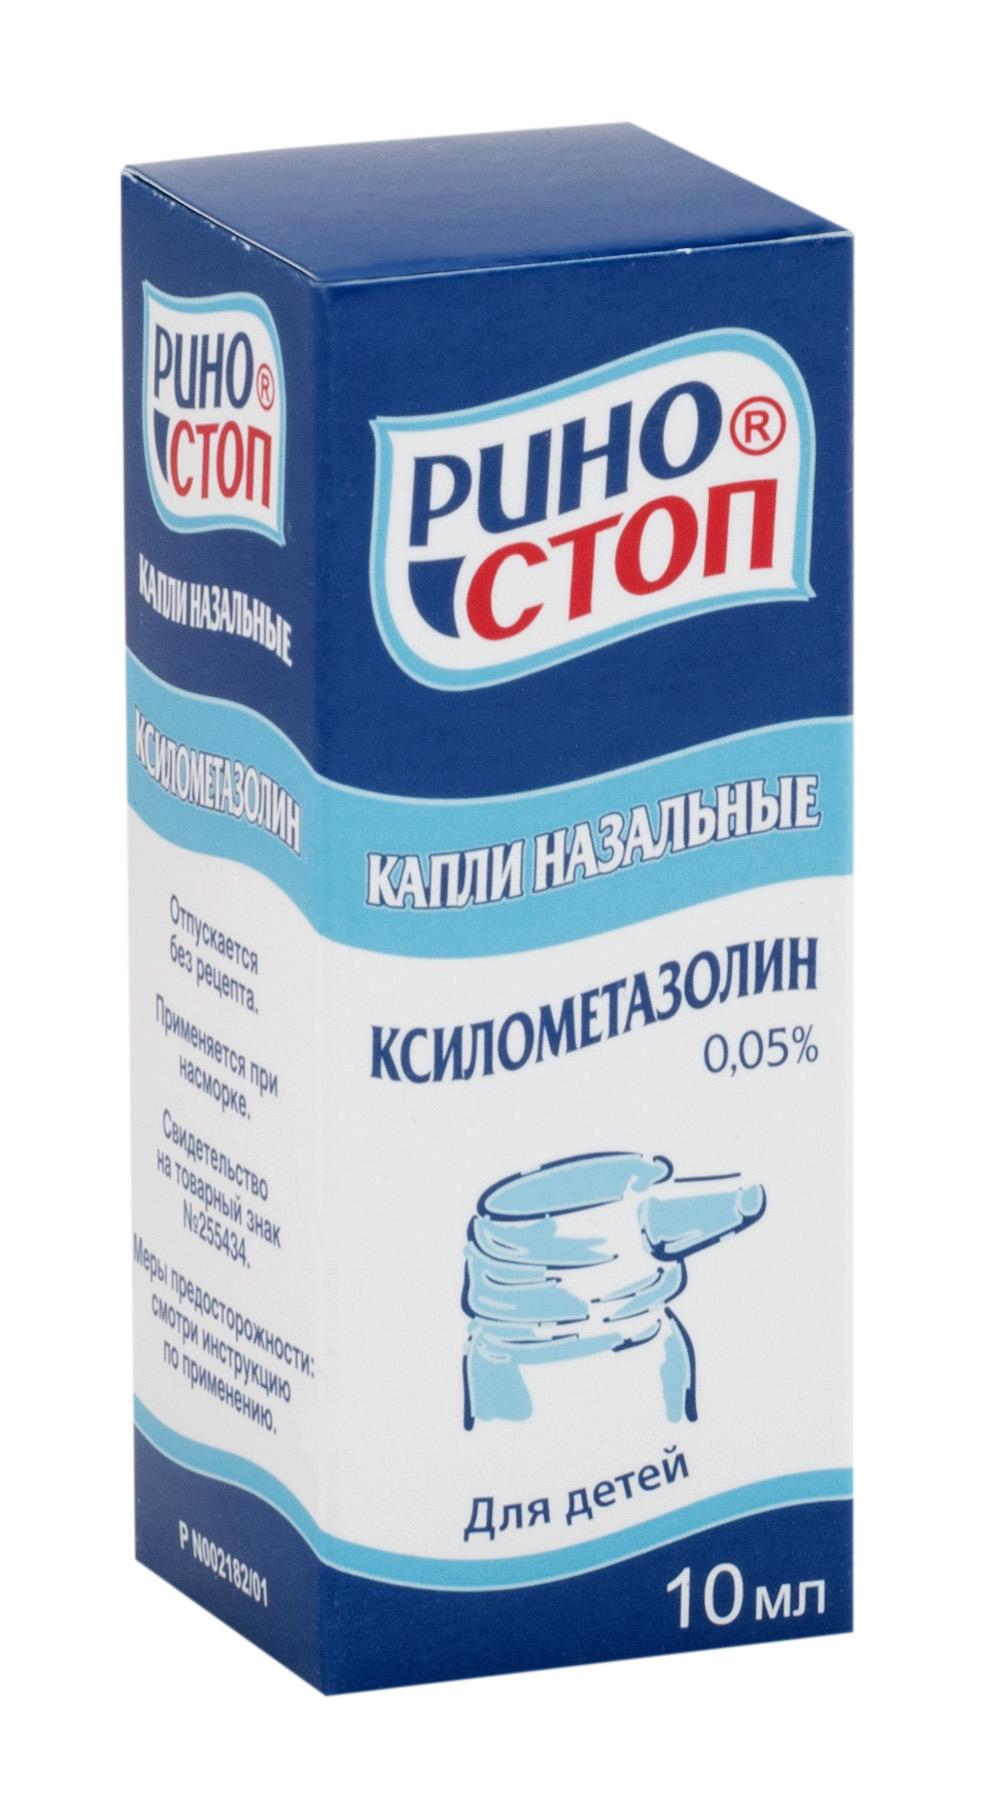 Риностоп капли наз. 0,05% 10мл n1